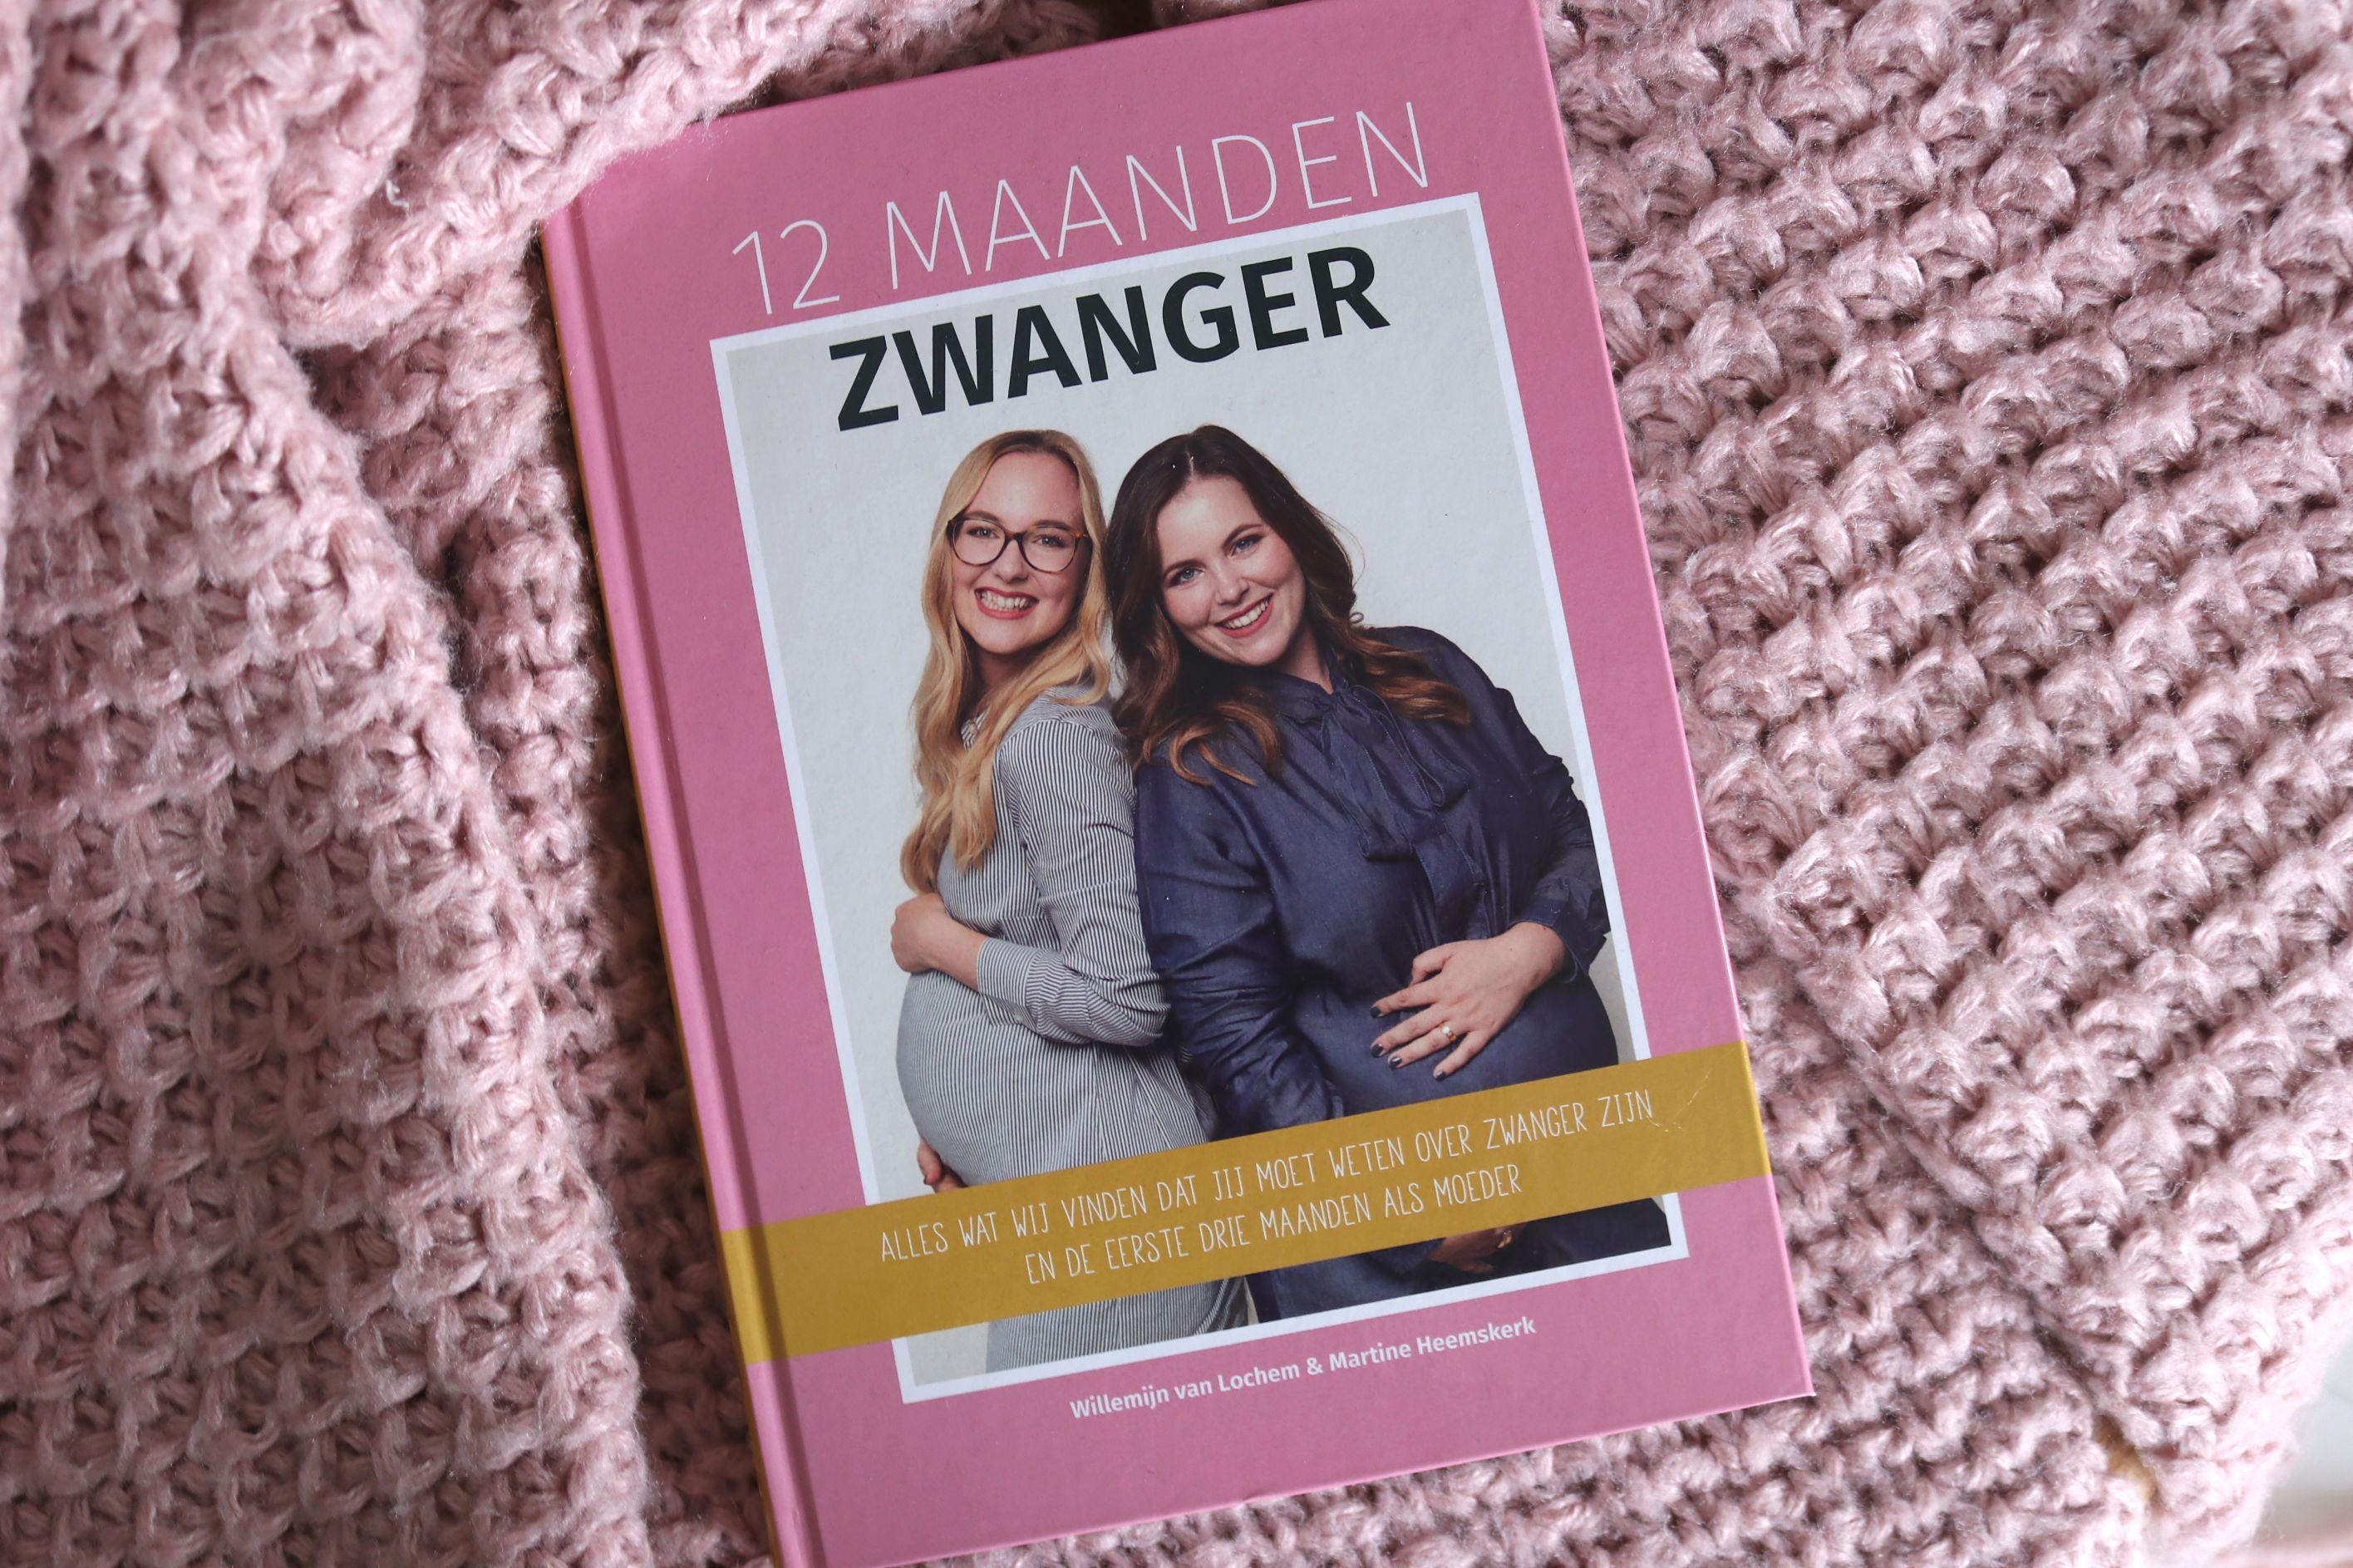 12 maanden zwanger, 12 maanden zwanger review, review 12 maanden zwanger, boek review, boek zwangerschap,